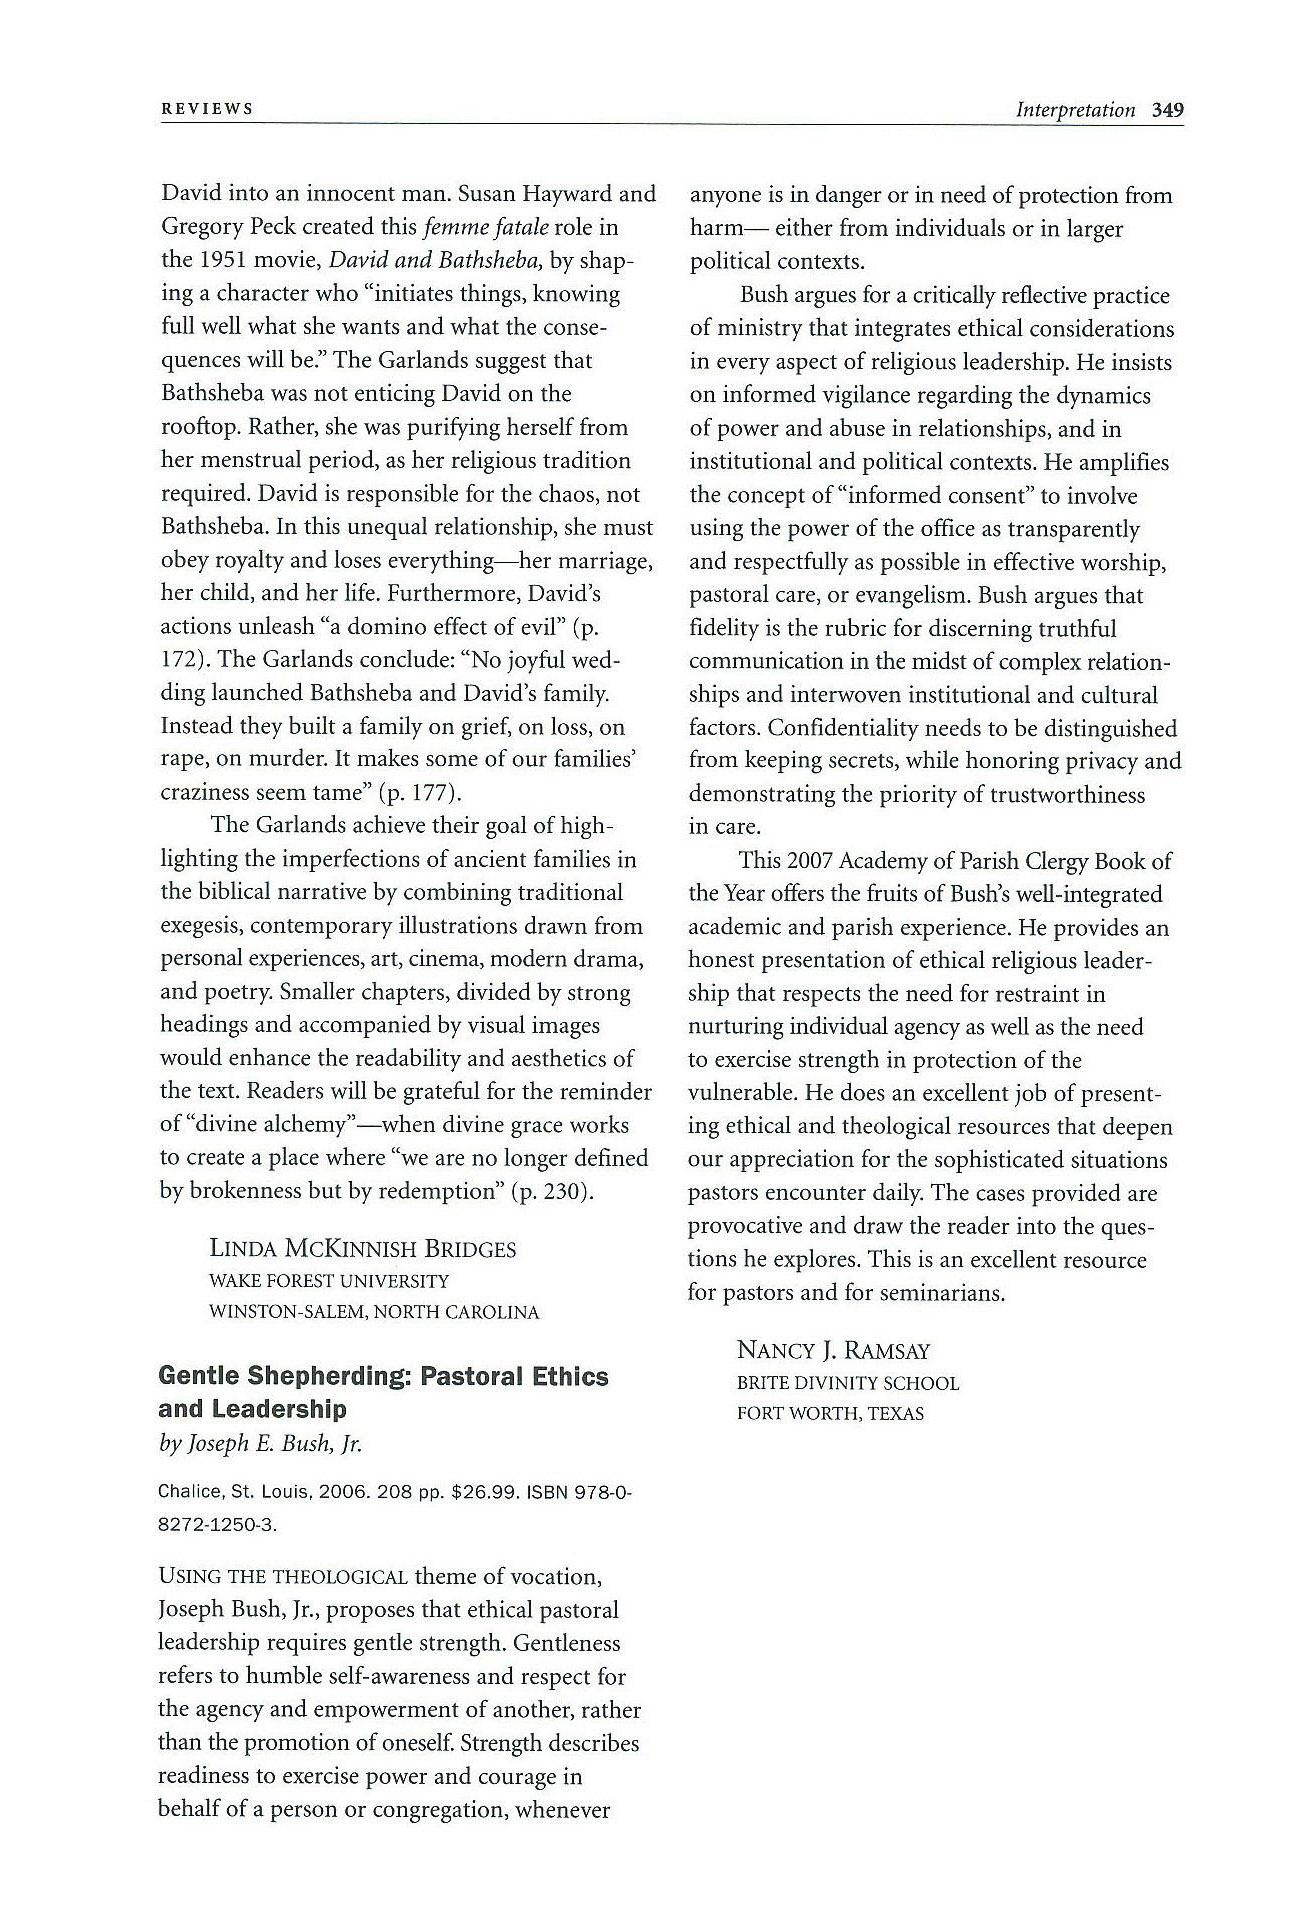 Academic essay citation